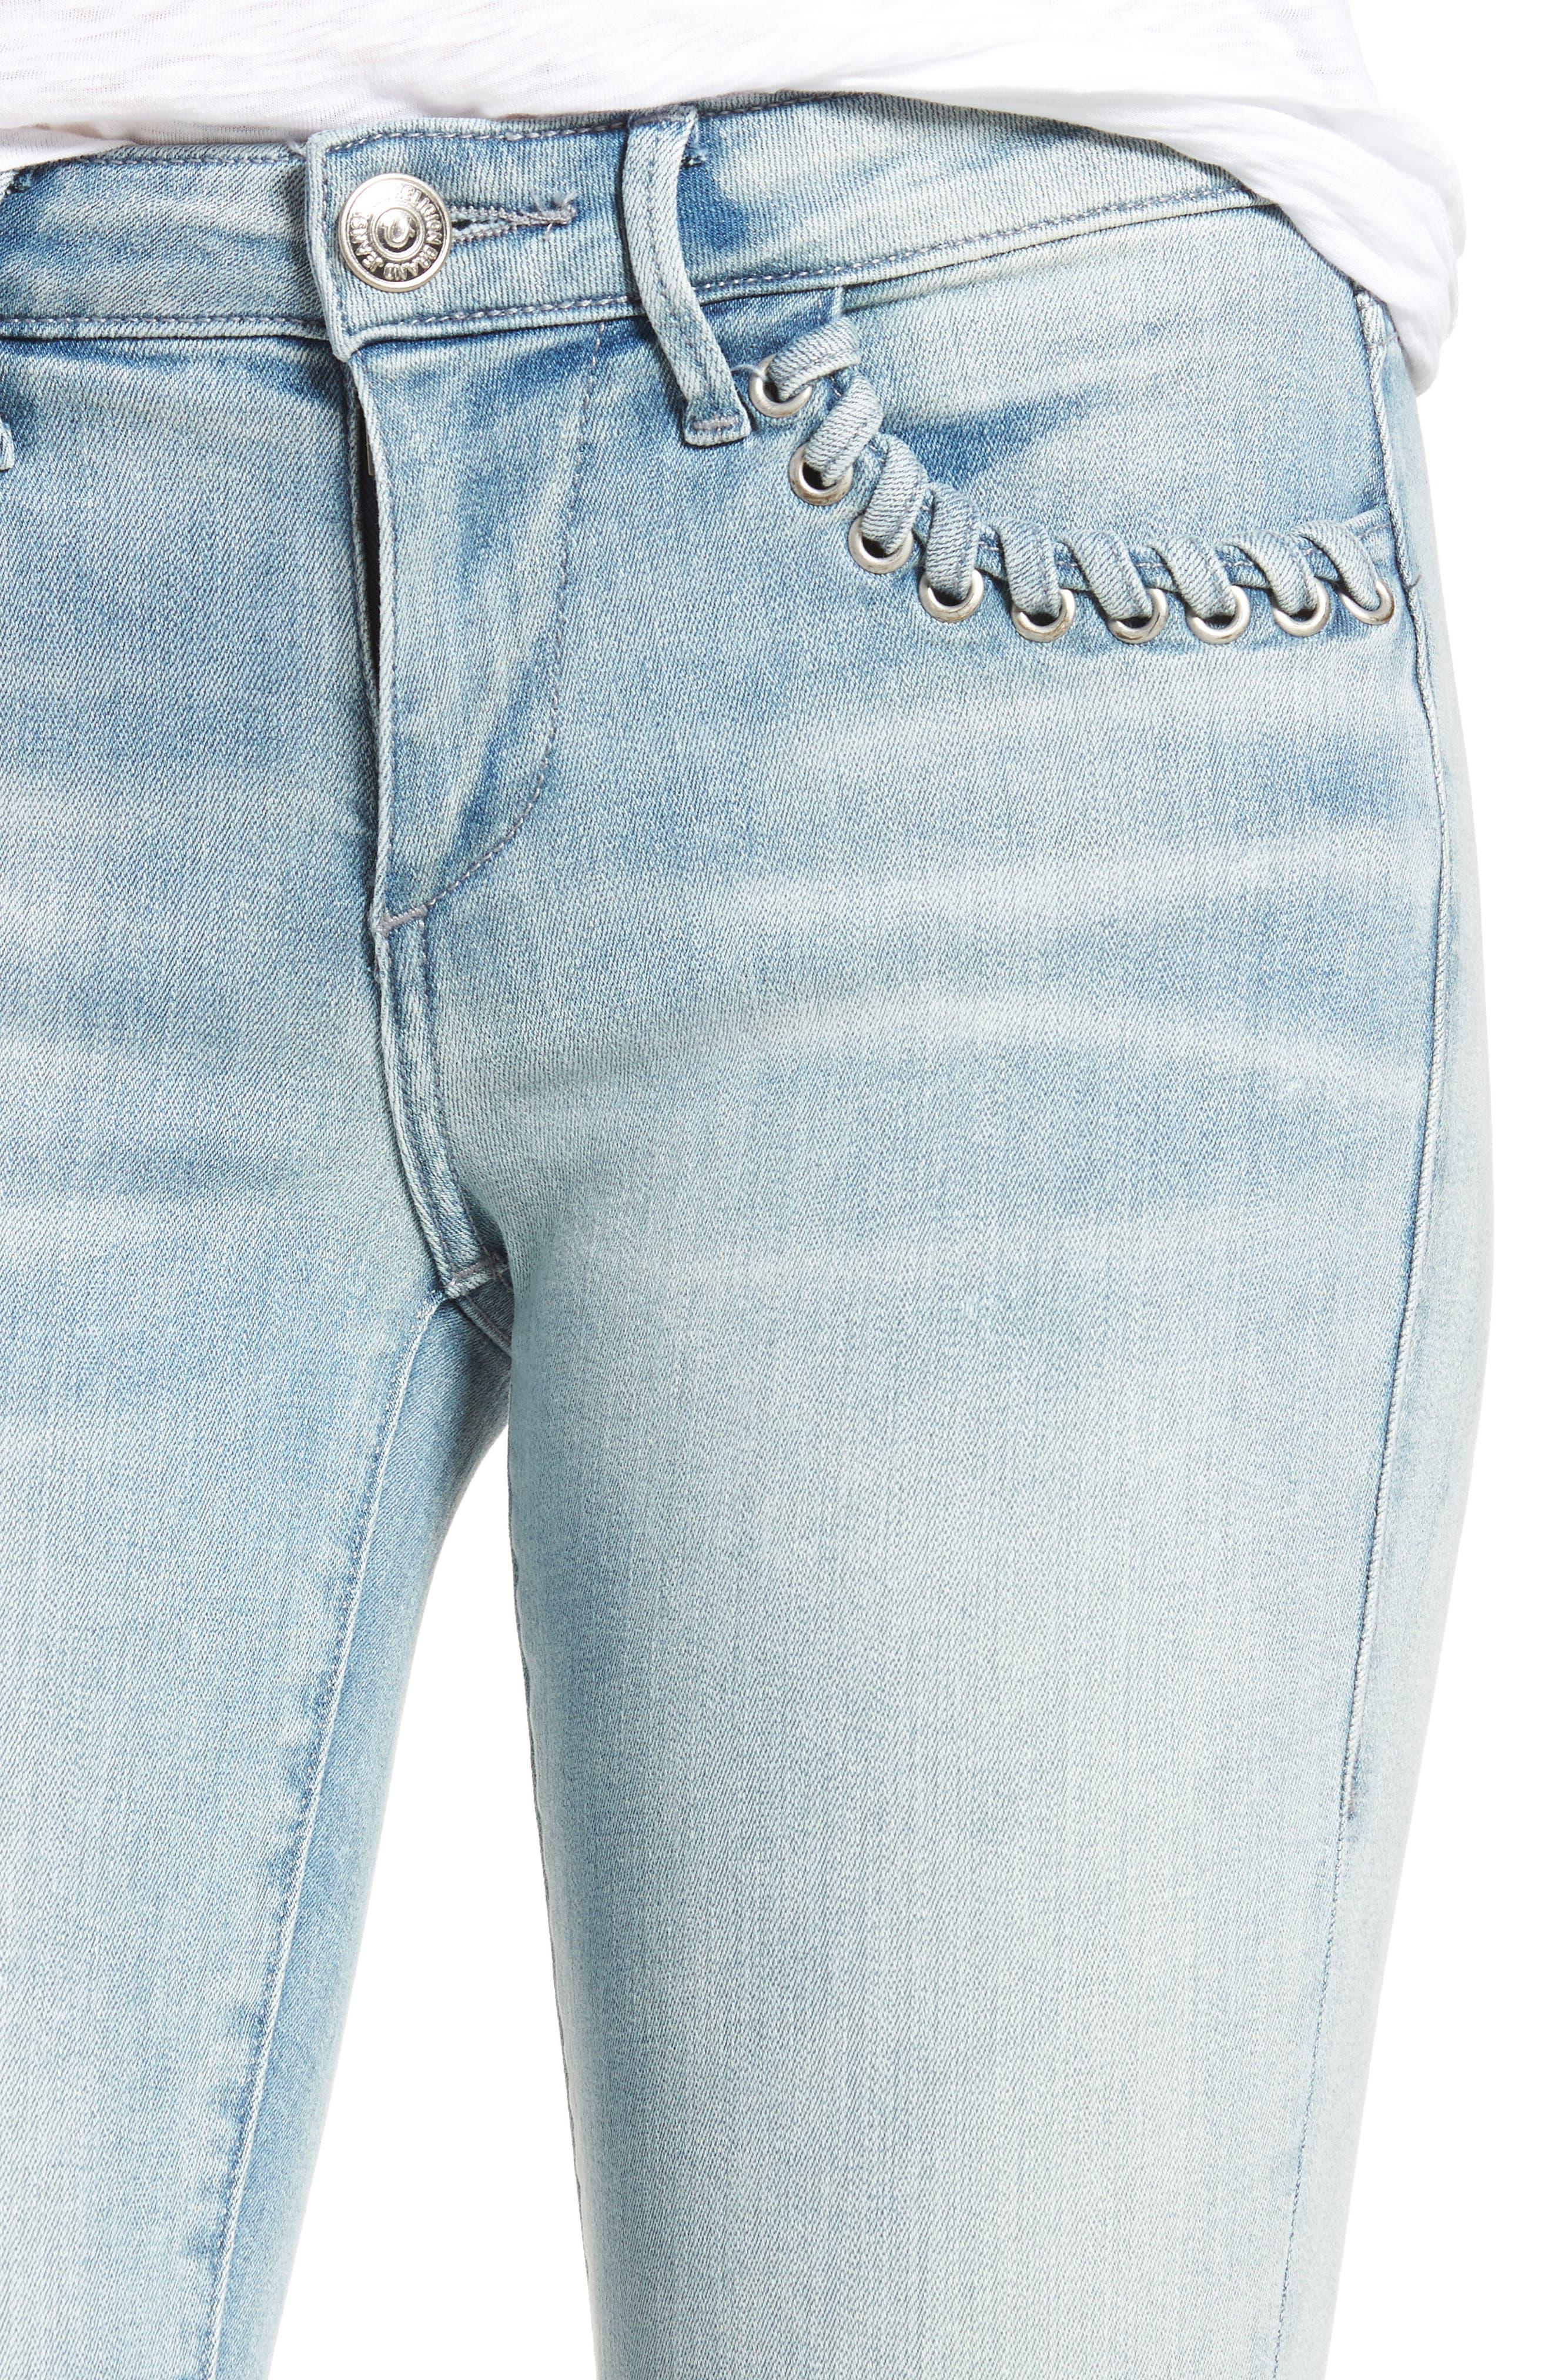 Halle Super Skinny Jeans,                             Alternate thumbnail 4, color,                             401